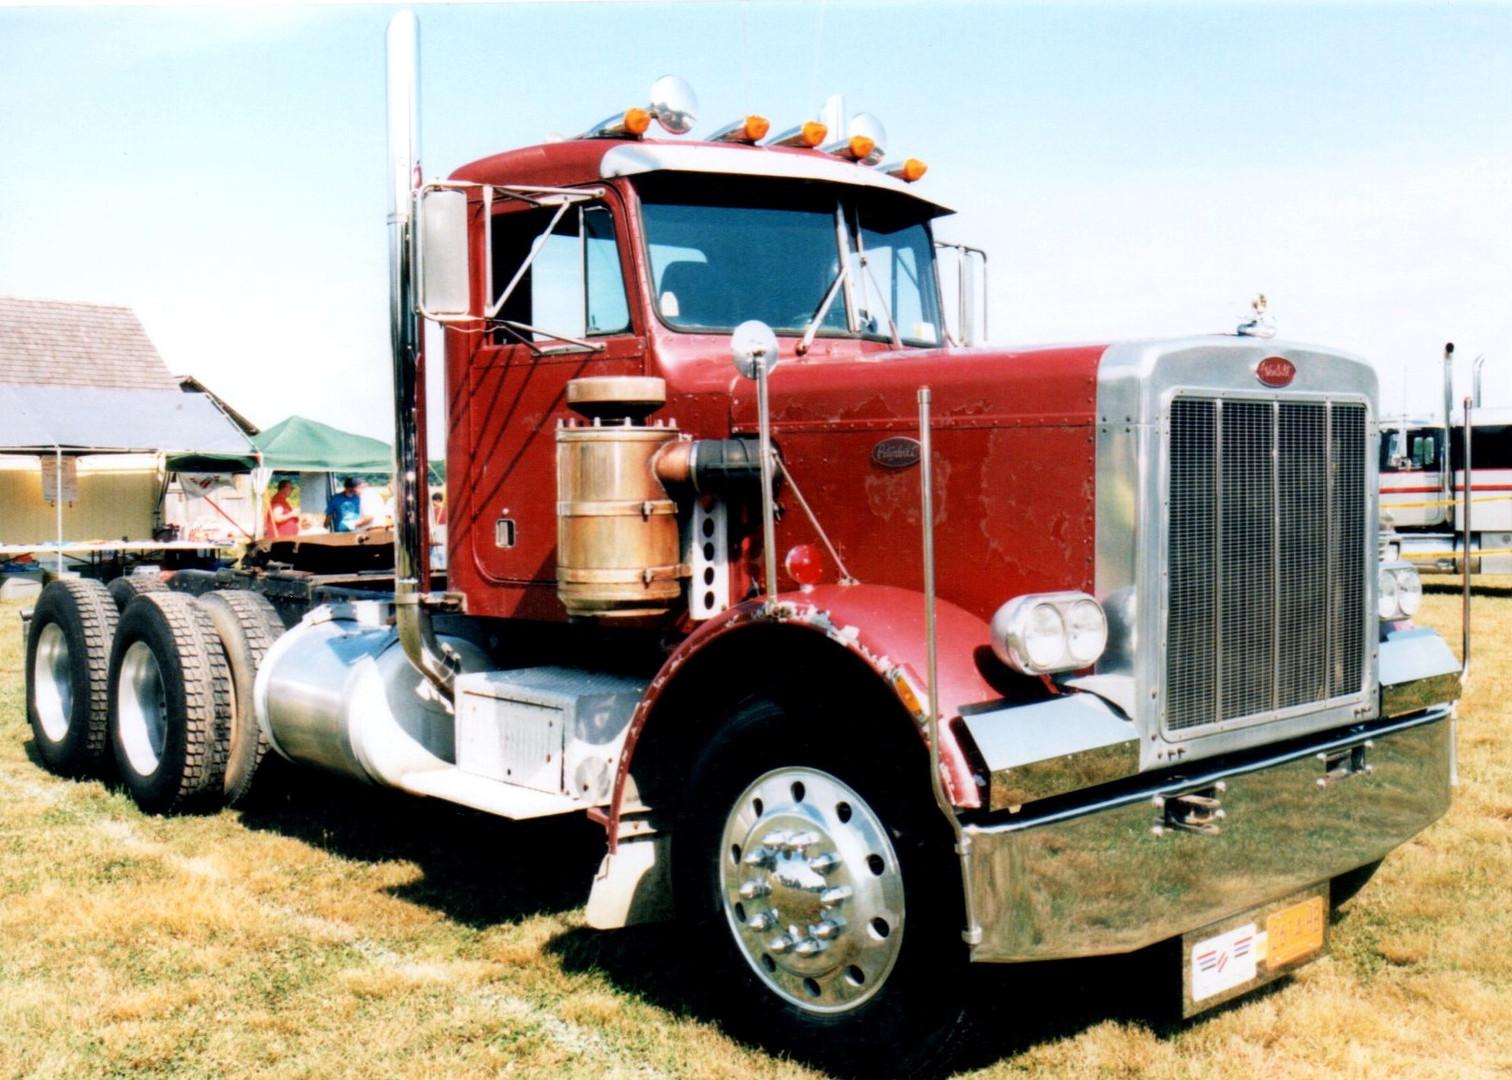 1976 Peterbilt 559 tractor - George Edwards